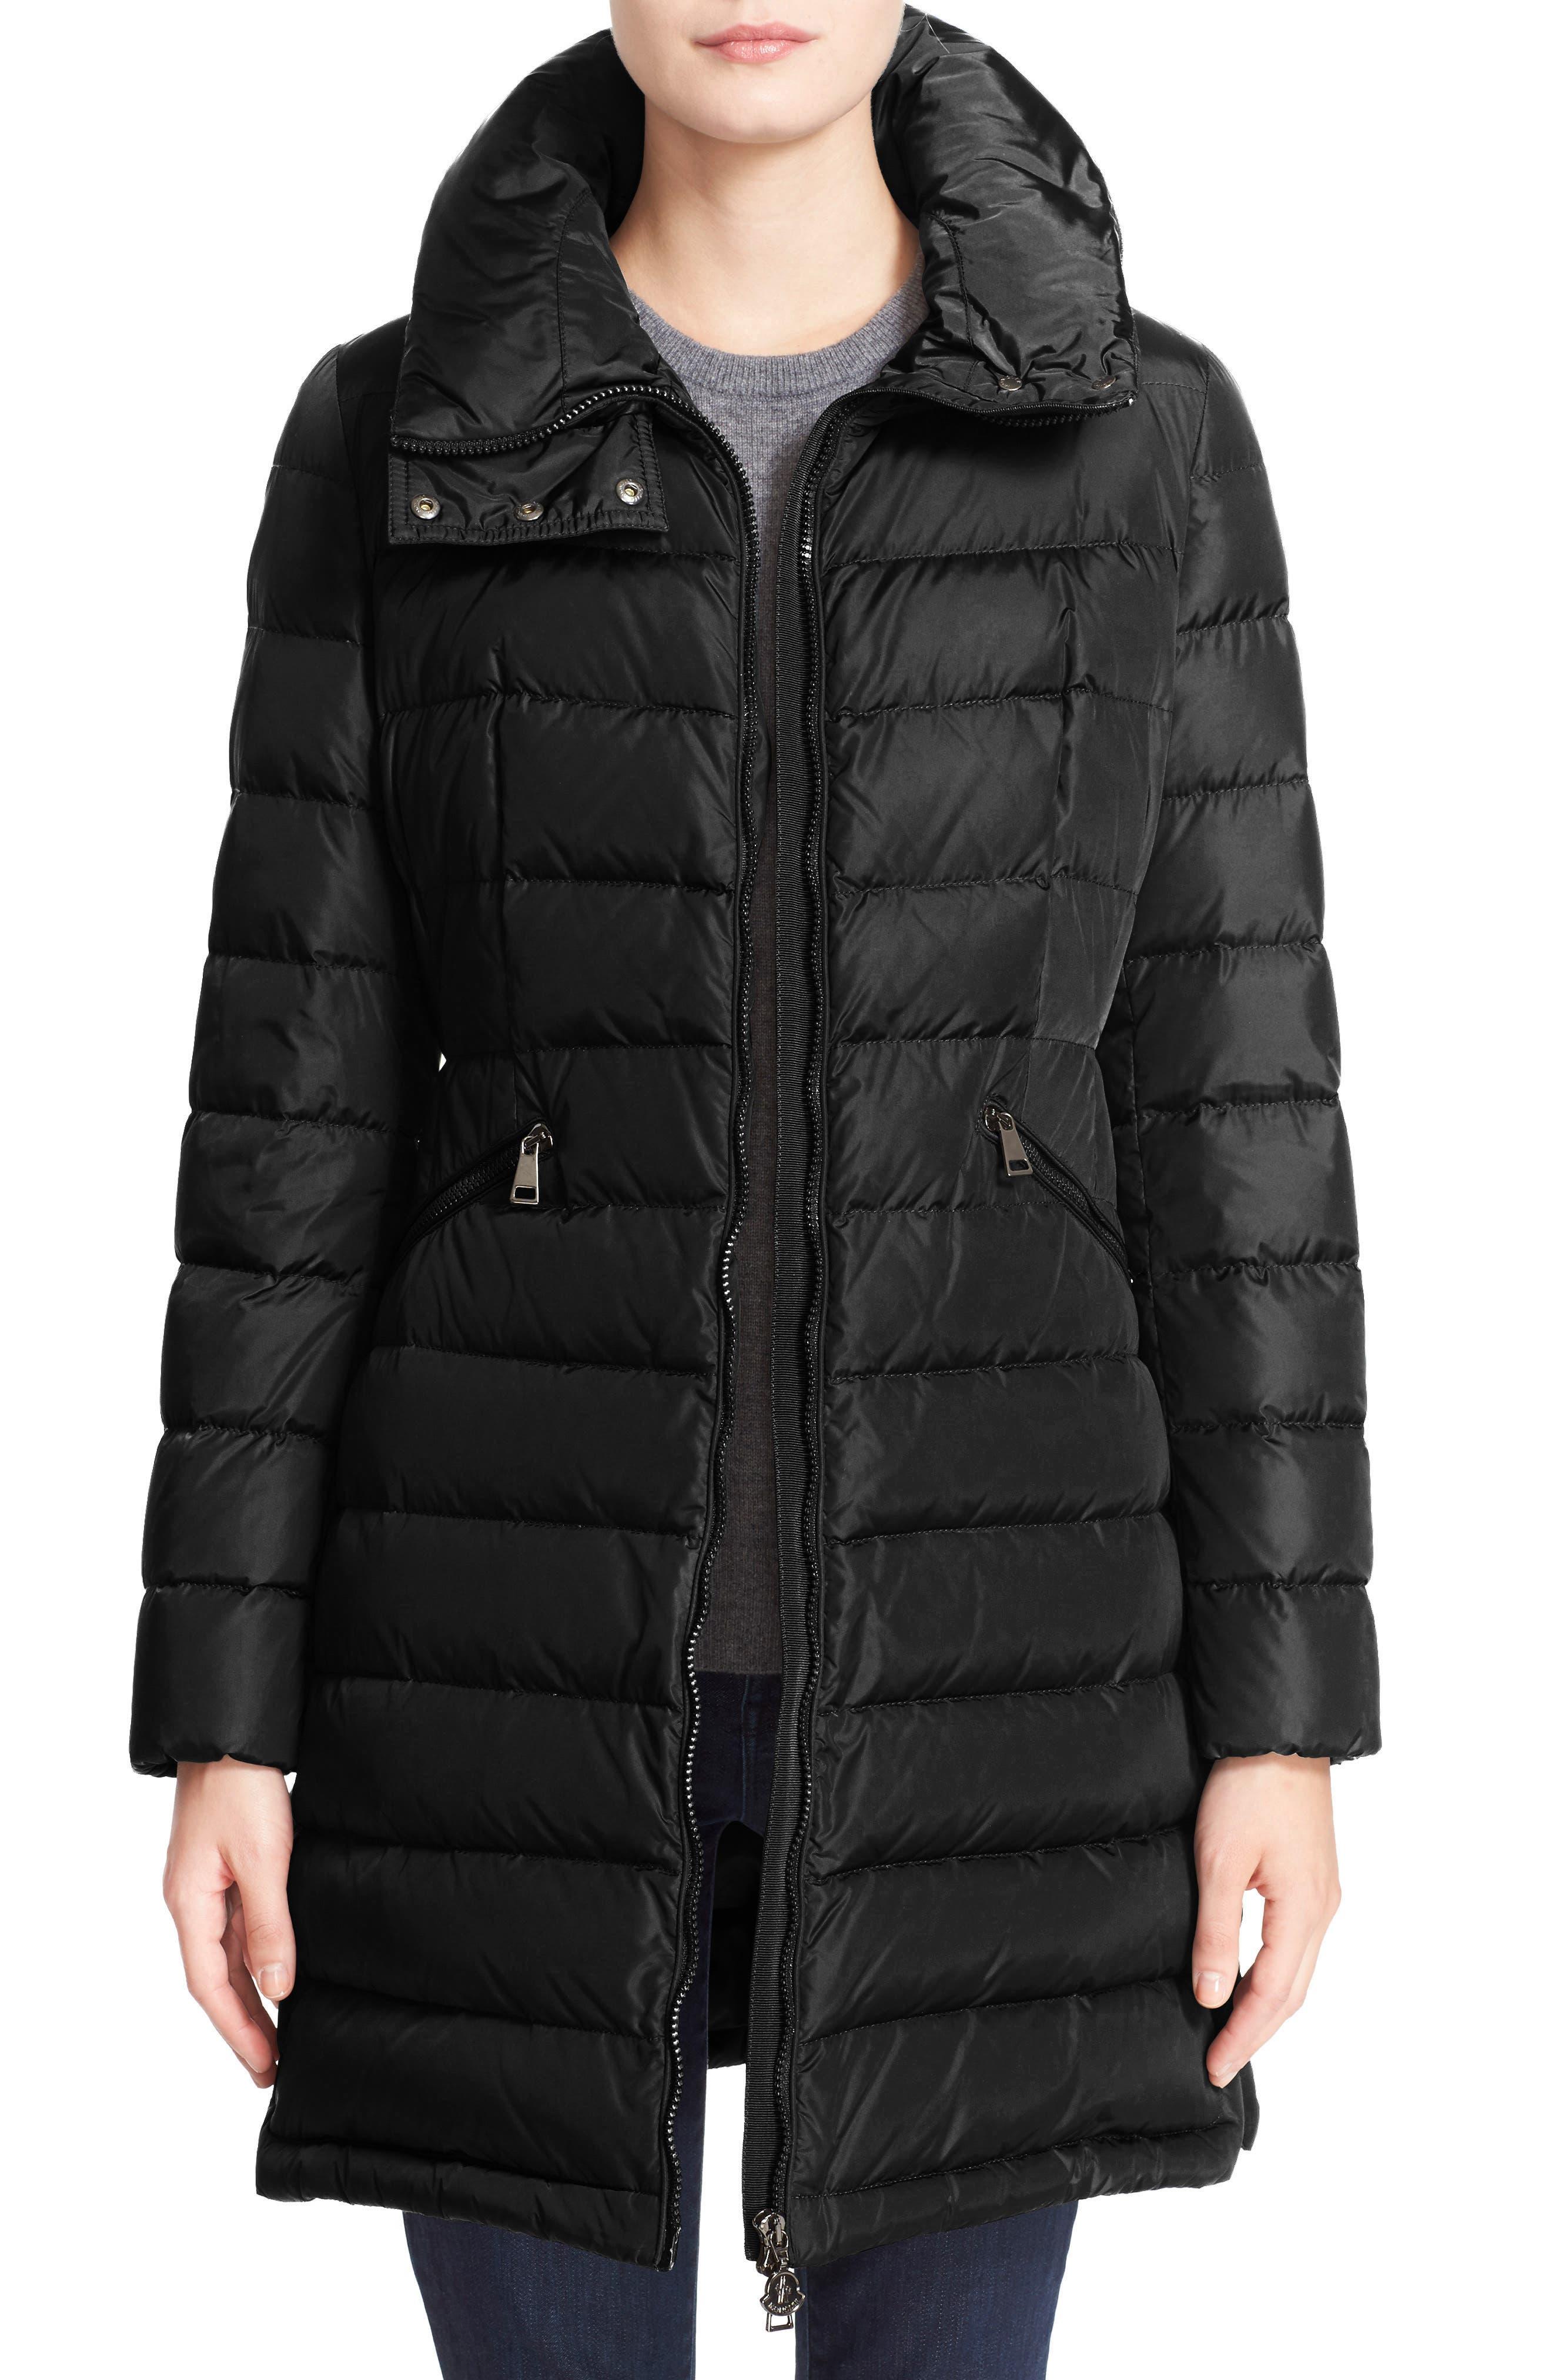 MONCLER 'Flammette' Water Resistant Long Hooded Down Coat, Main, color, BLK